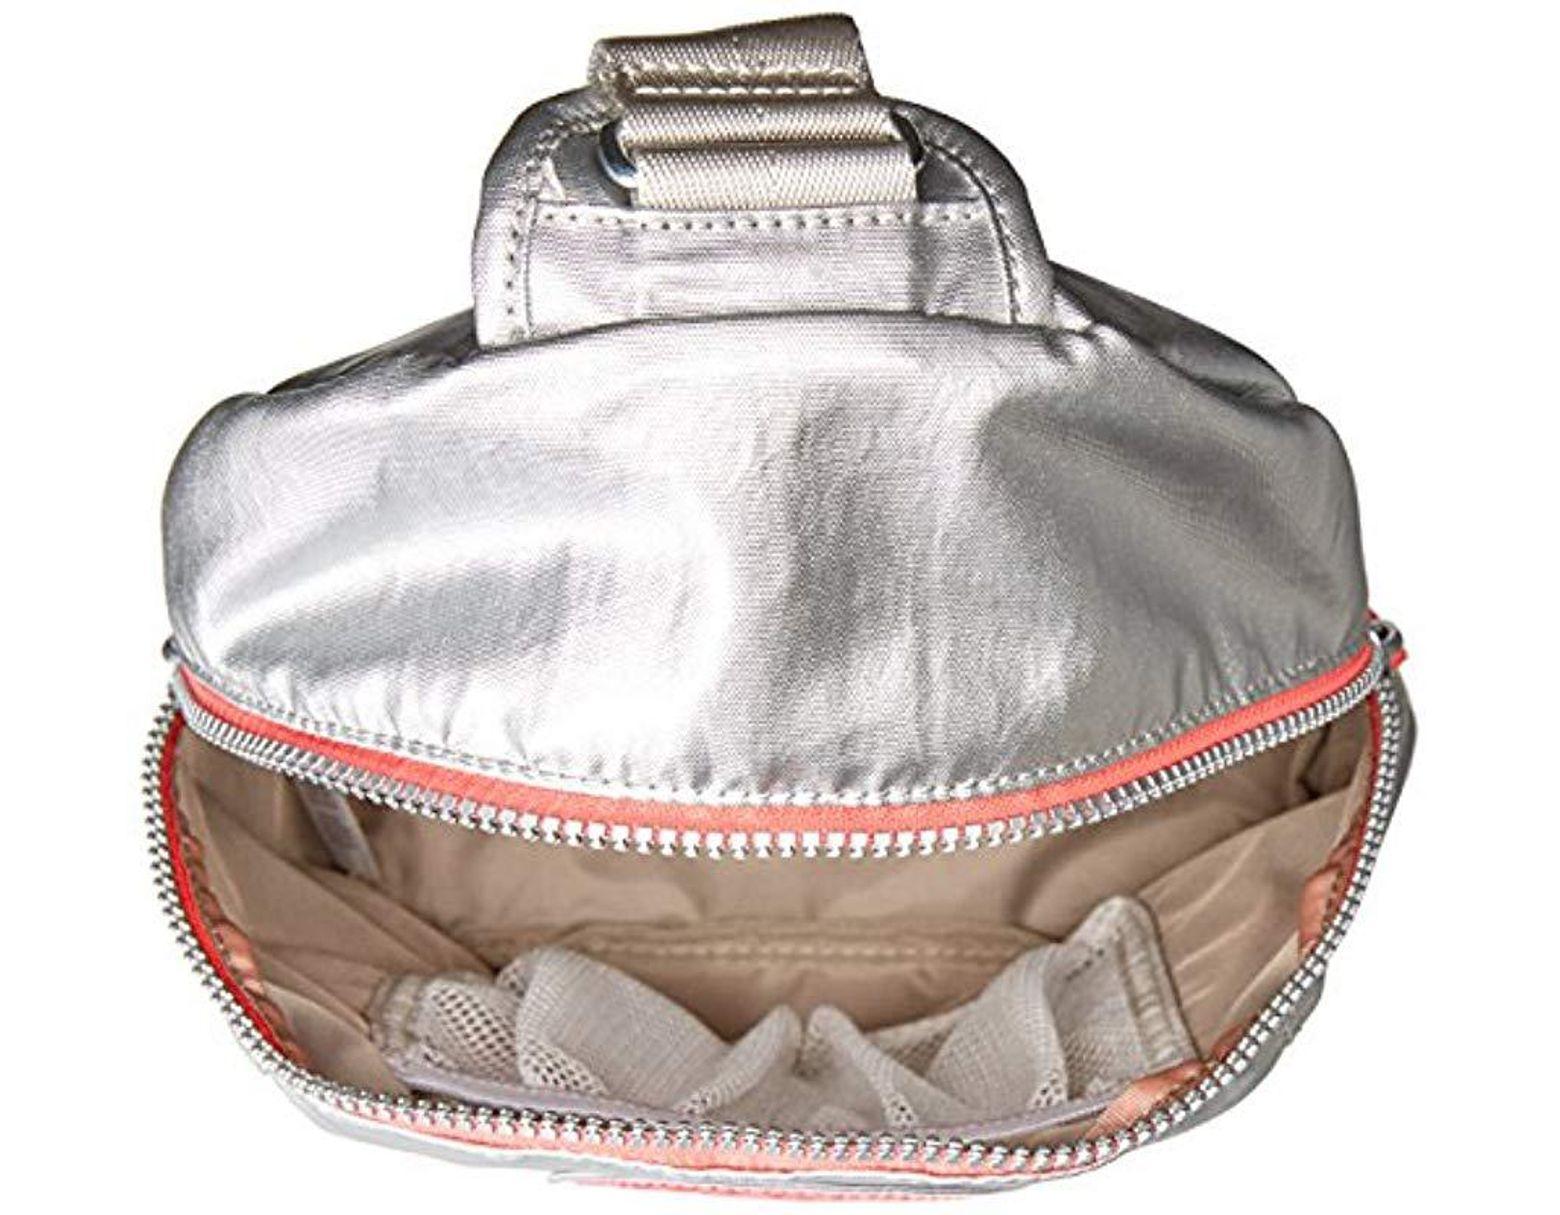 e02851e634 Kipling Bente Platinum Metallic Sport Sling Backpack - Save 6% - Lyst